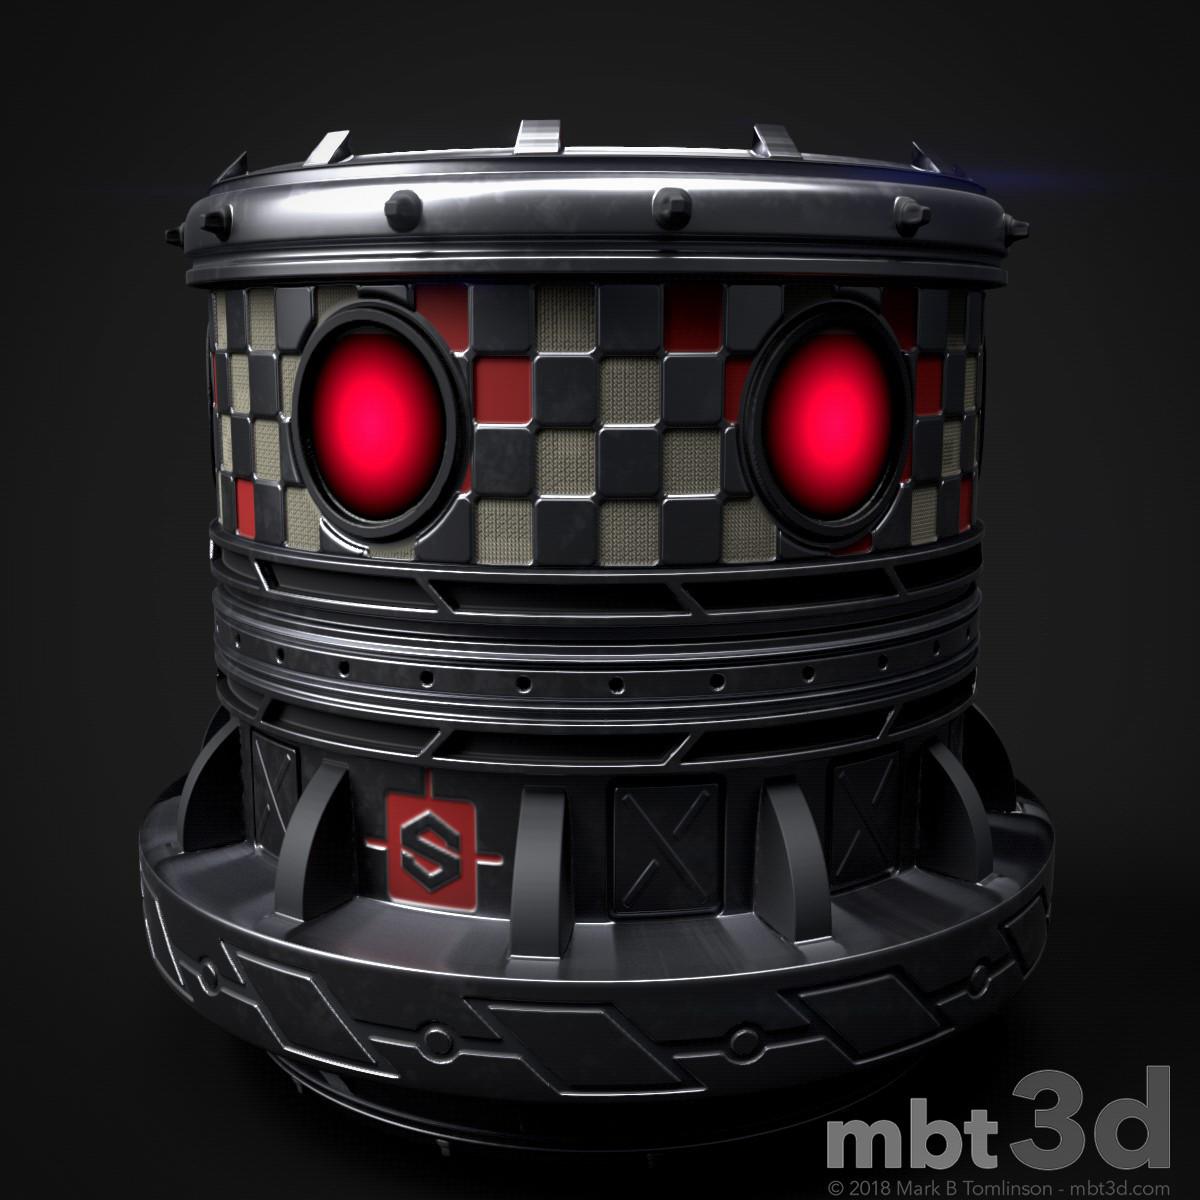 Mark b tomlinson capsule final 01